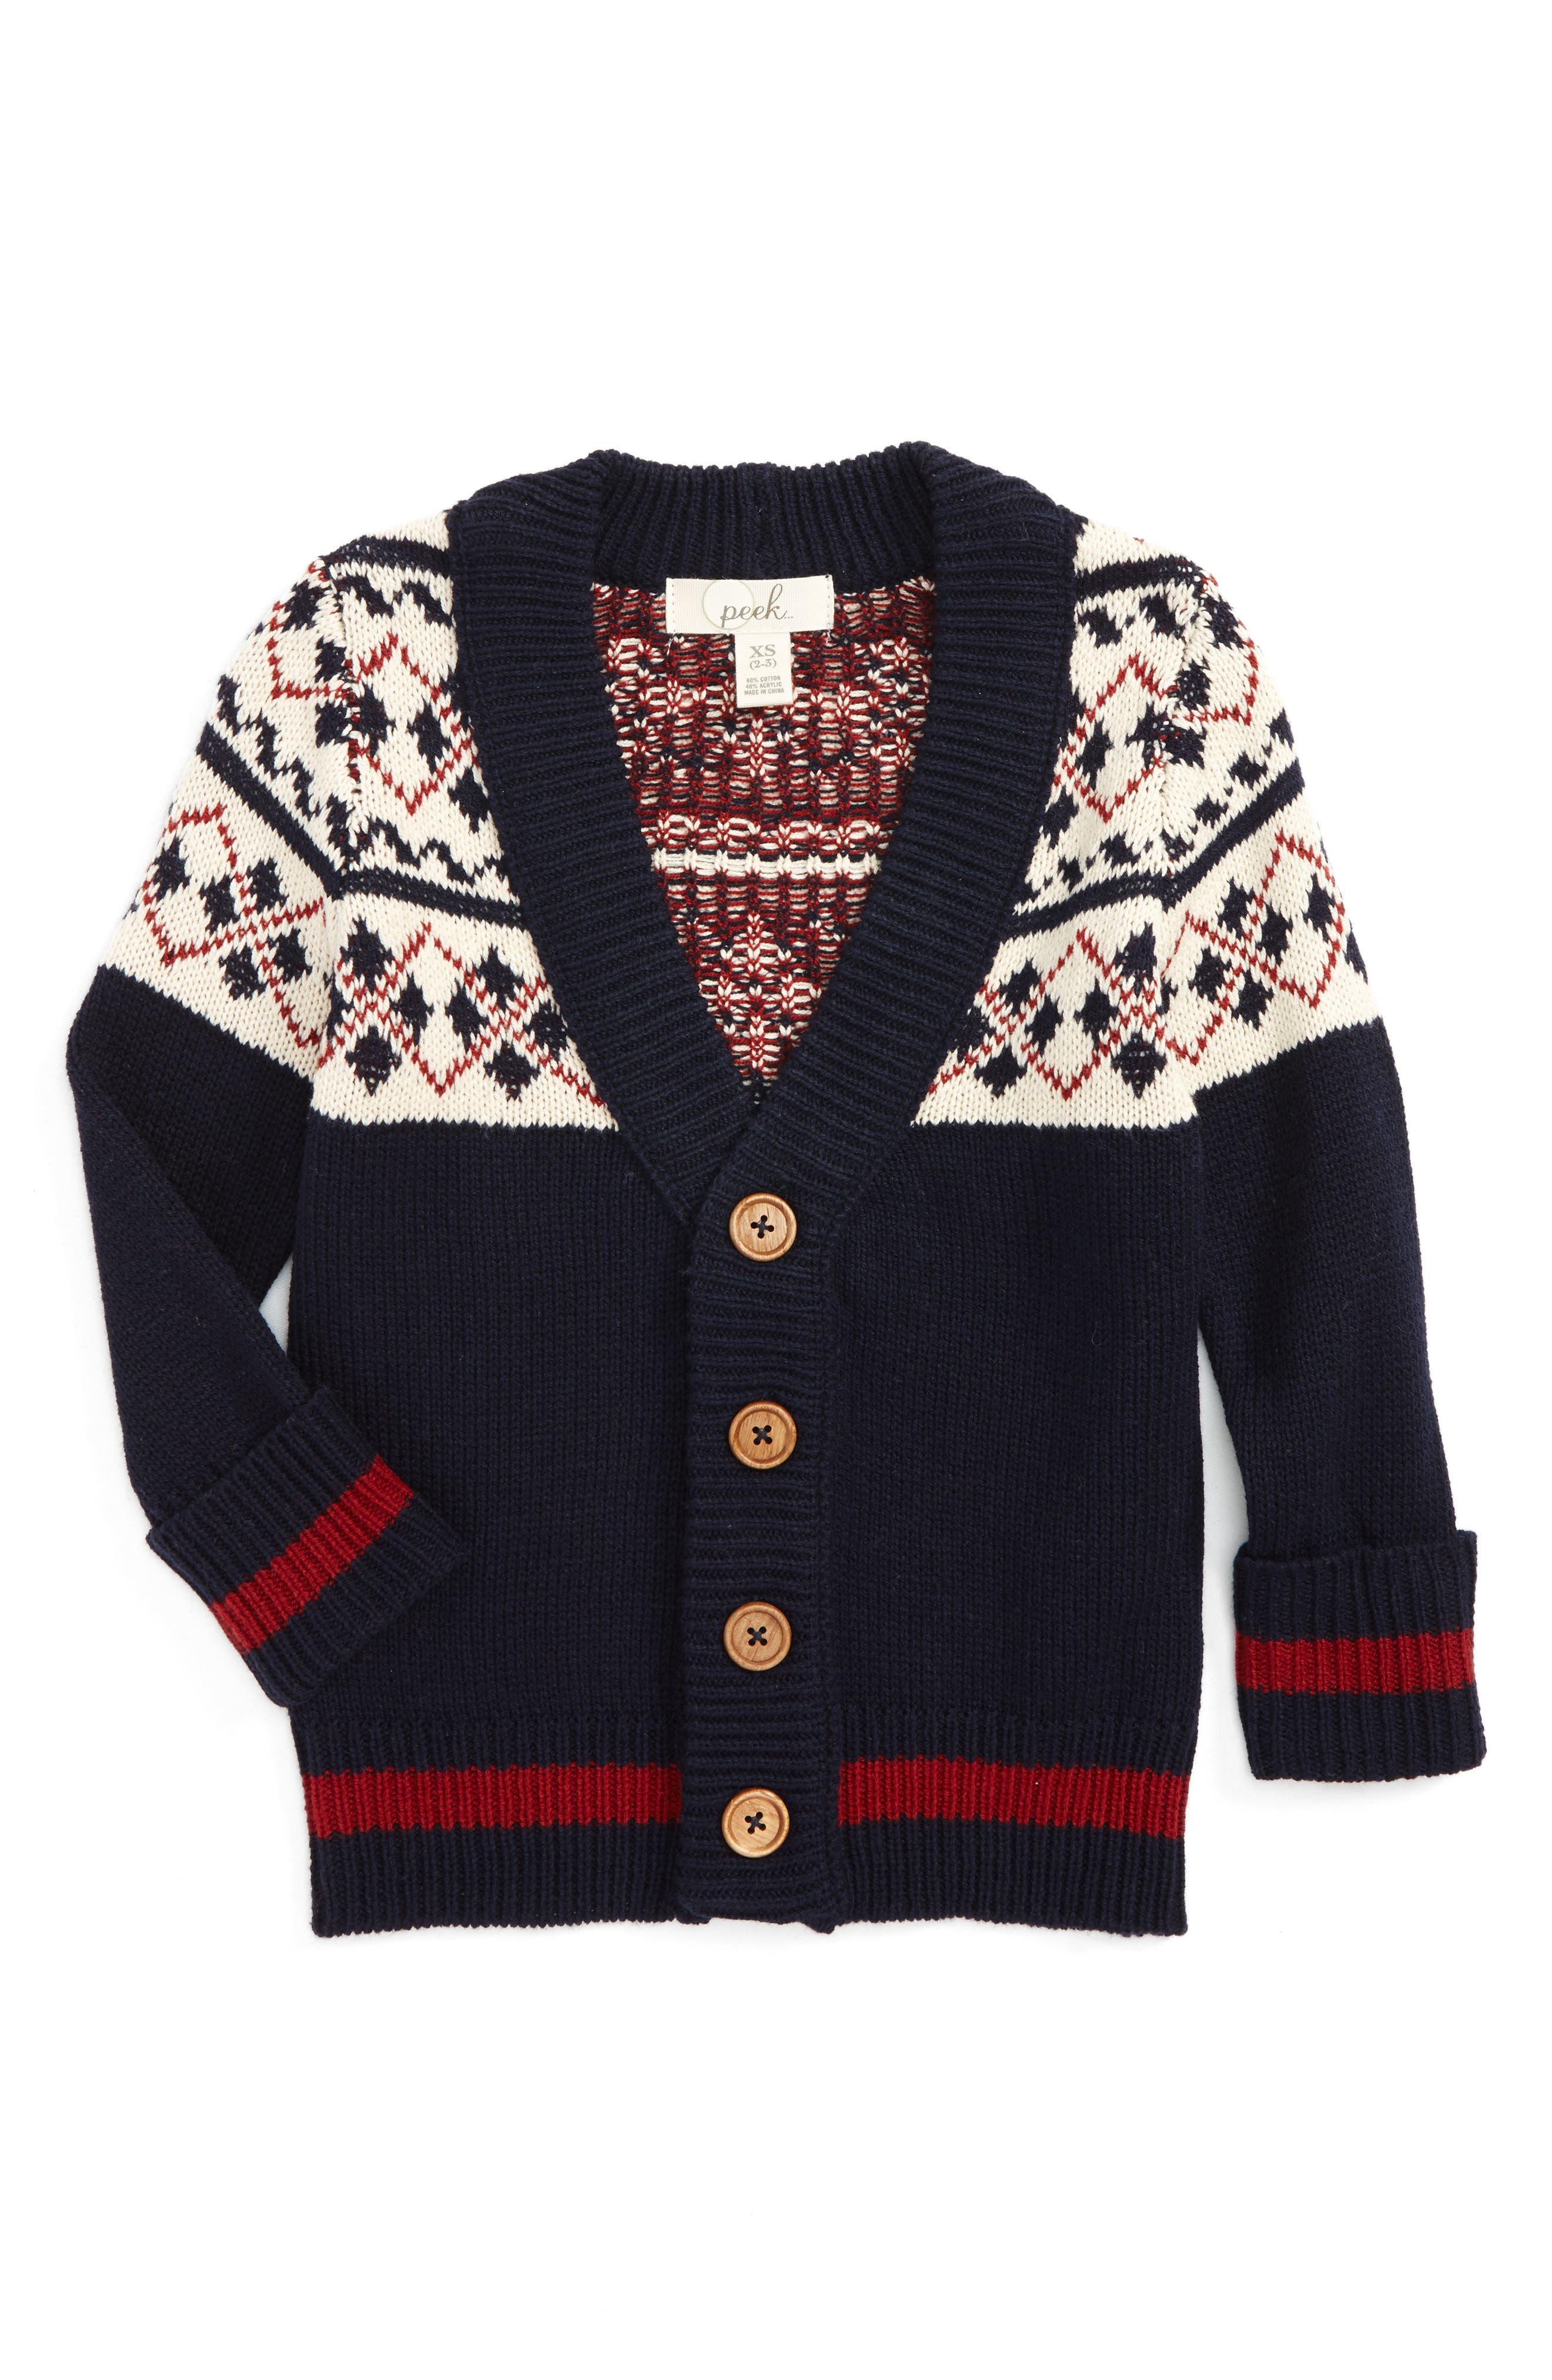 Mackai Pattern Cardigan Sweater,                         Main,                         color, Navy